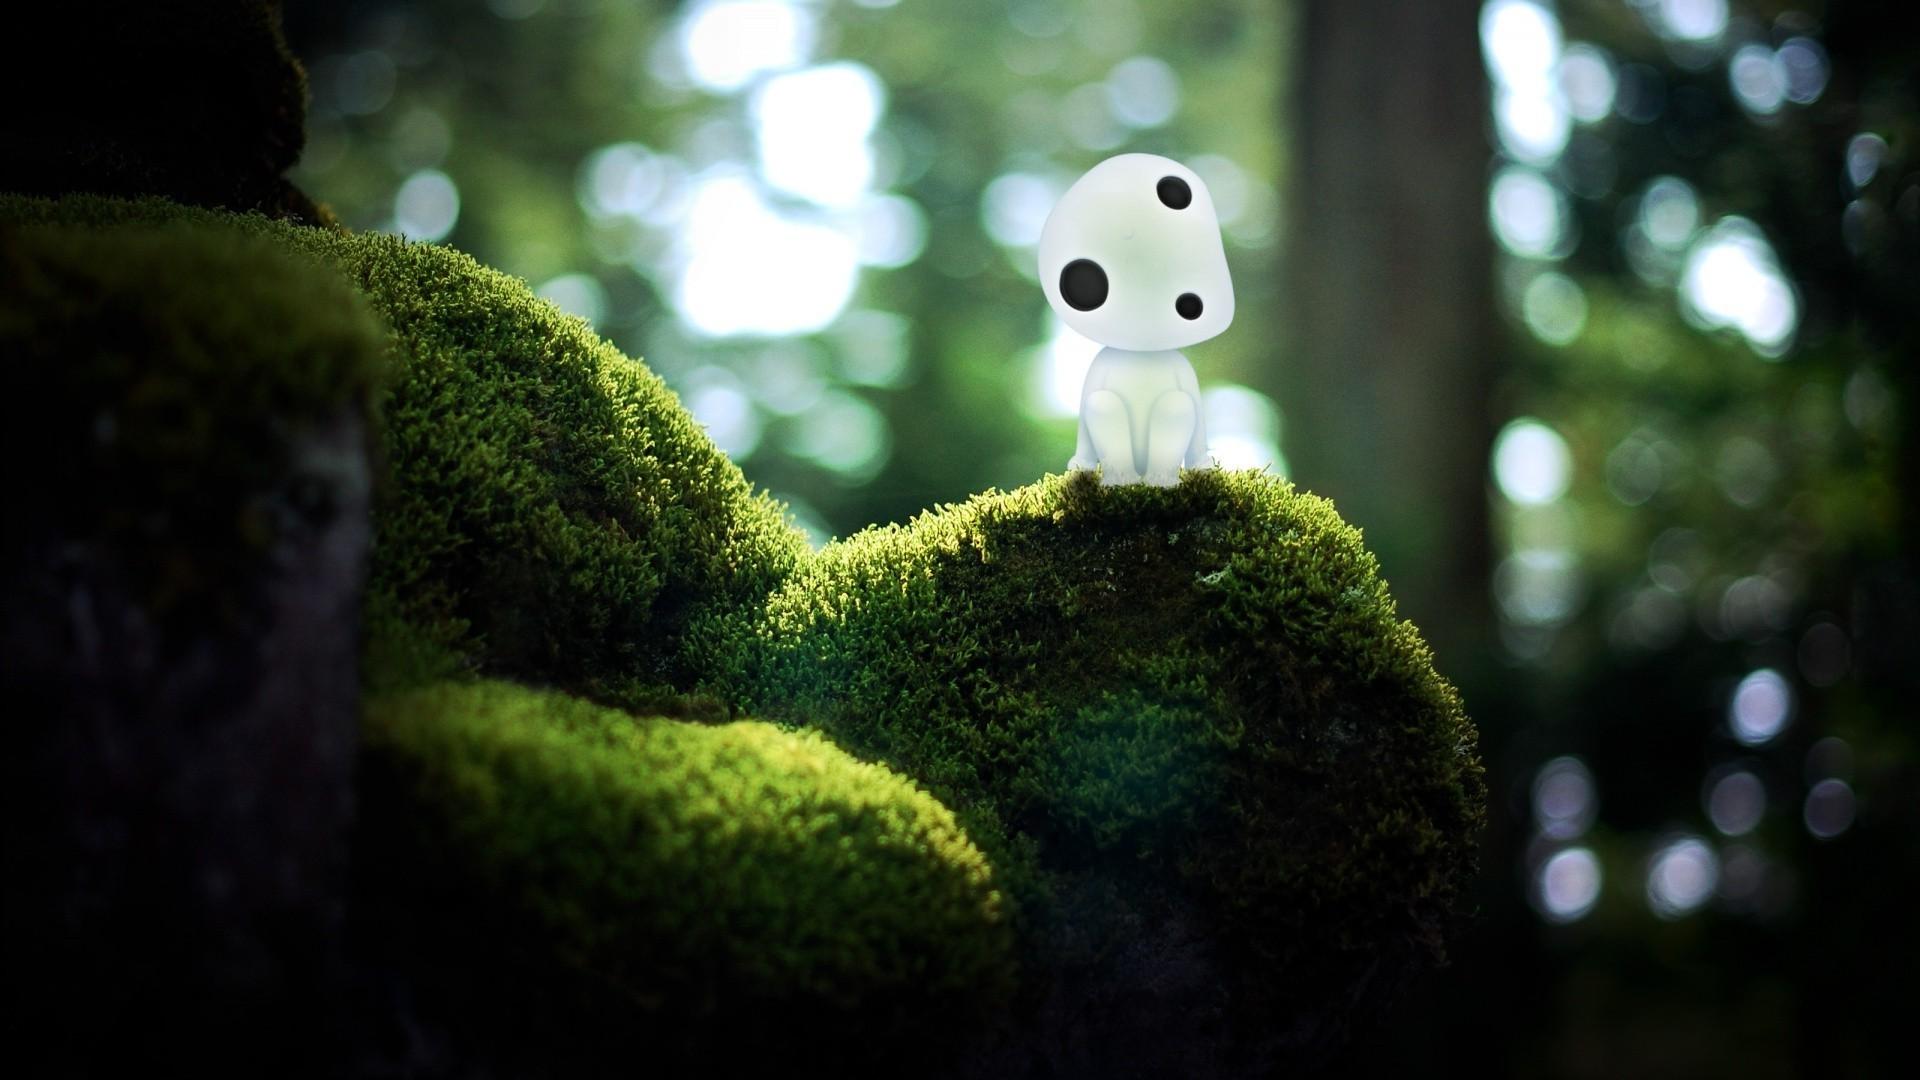 Ghibli Background Kodama 51 images 1920x1080